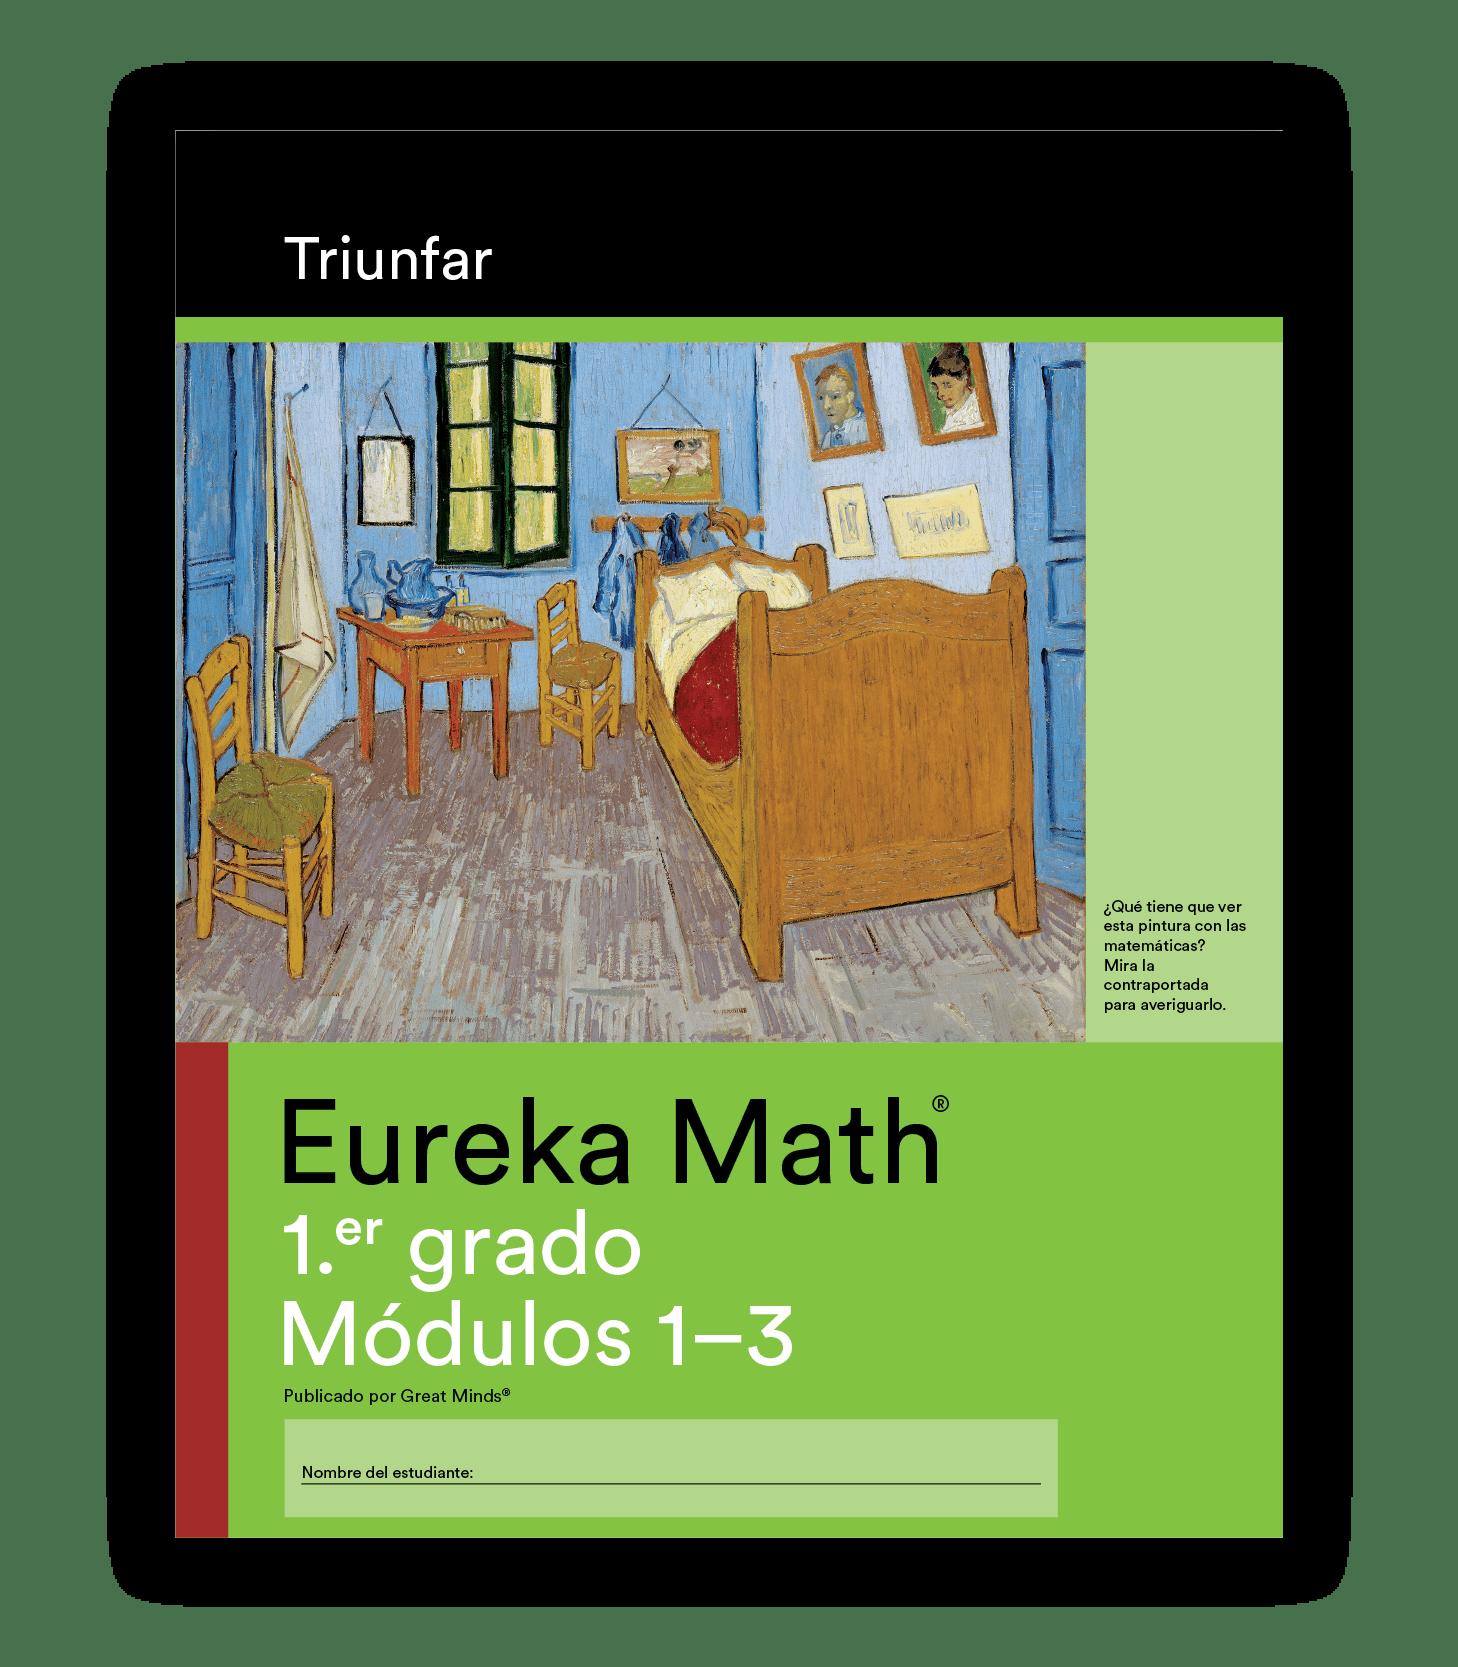 Eureka Math Succeed Book in Spanish for Grade 1